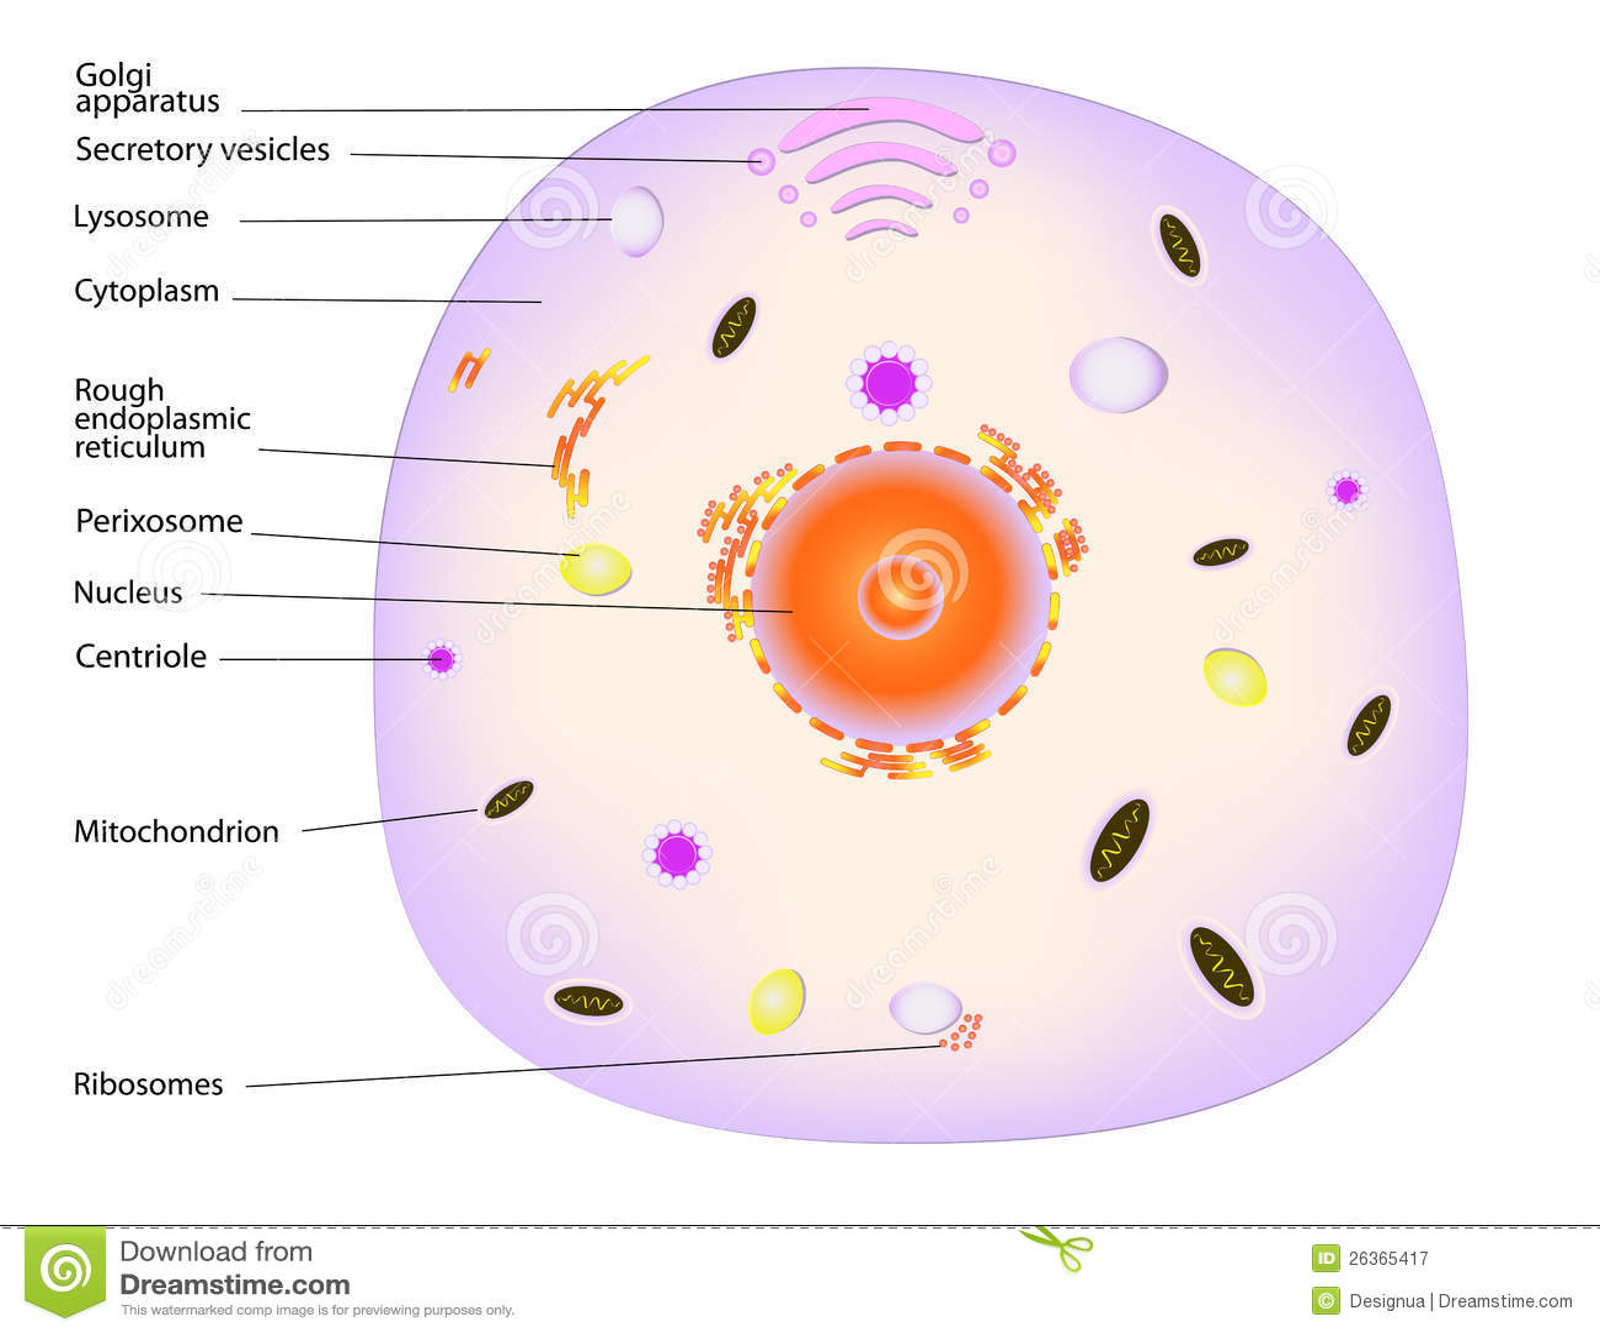 animal cloning diagram glass eye parts cell stock vector illustration of cytoplasm nano